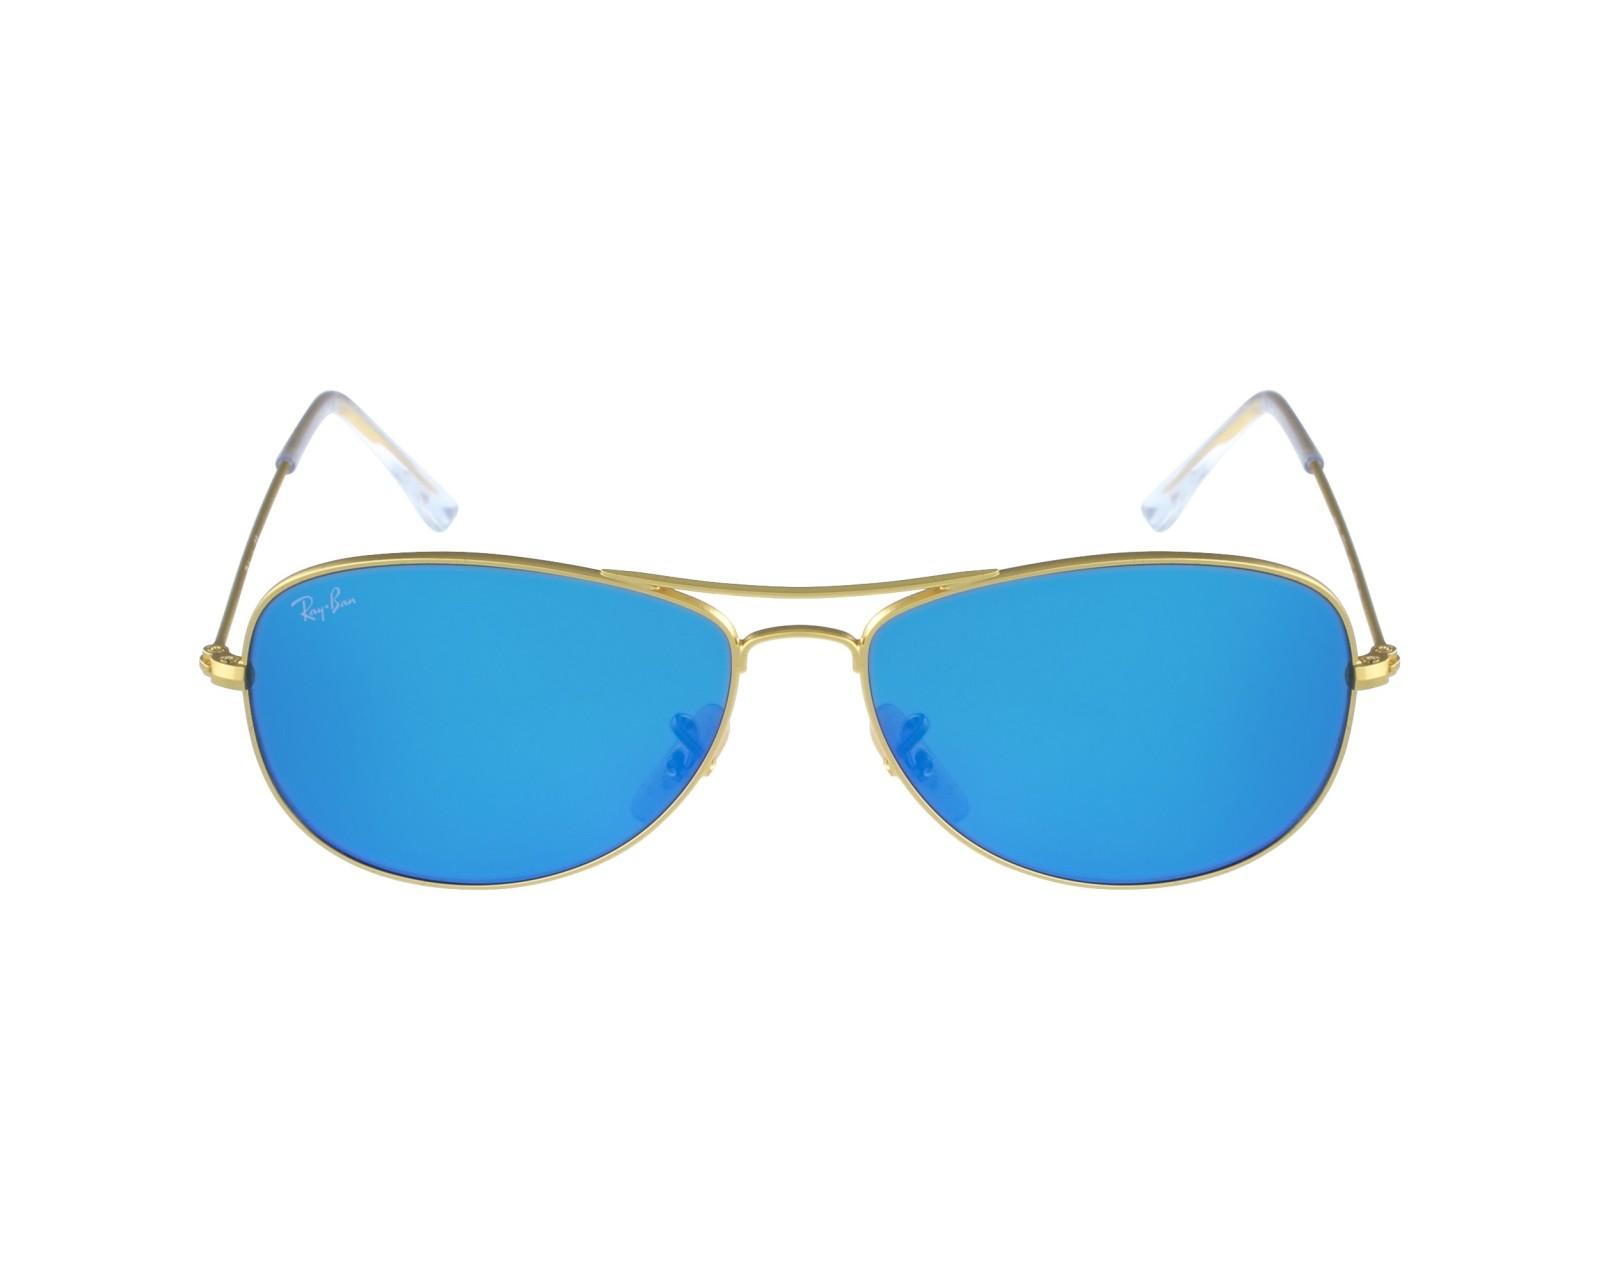 8cface6a3d thumbnail Sunglasses Ray-Ban RB-3362 112 17 - Gold profile view